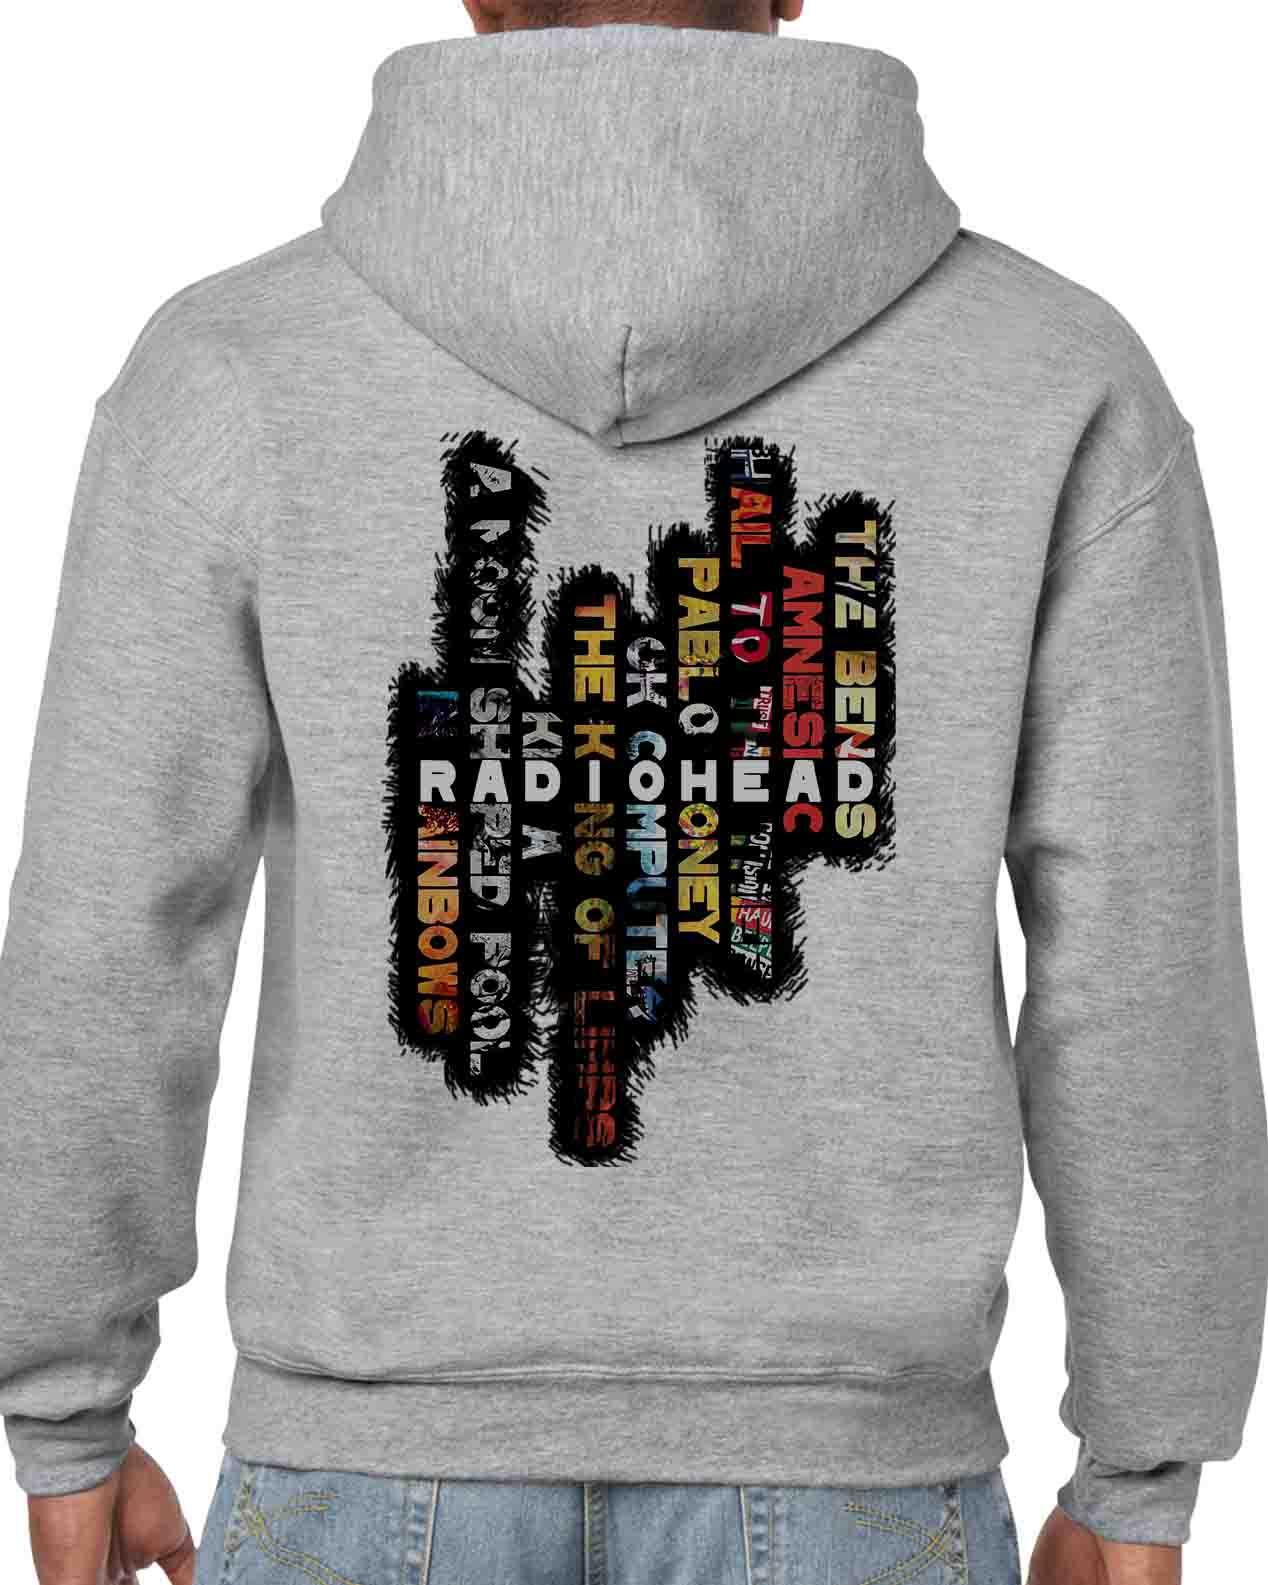 Radiohead - Albums